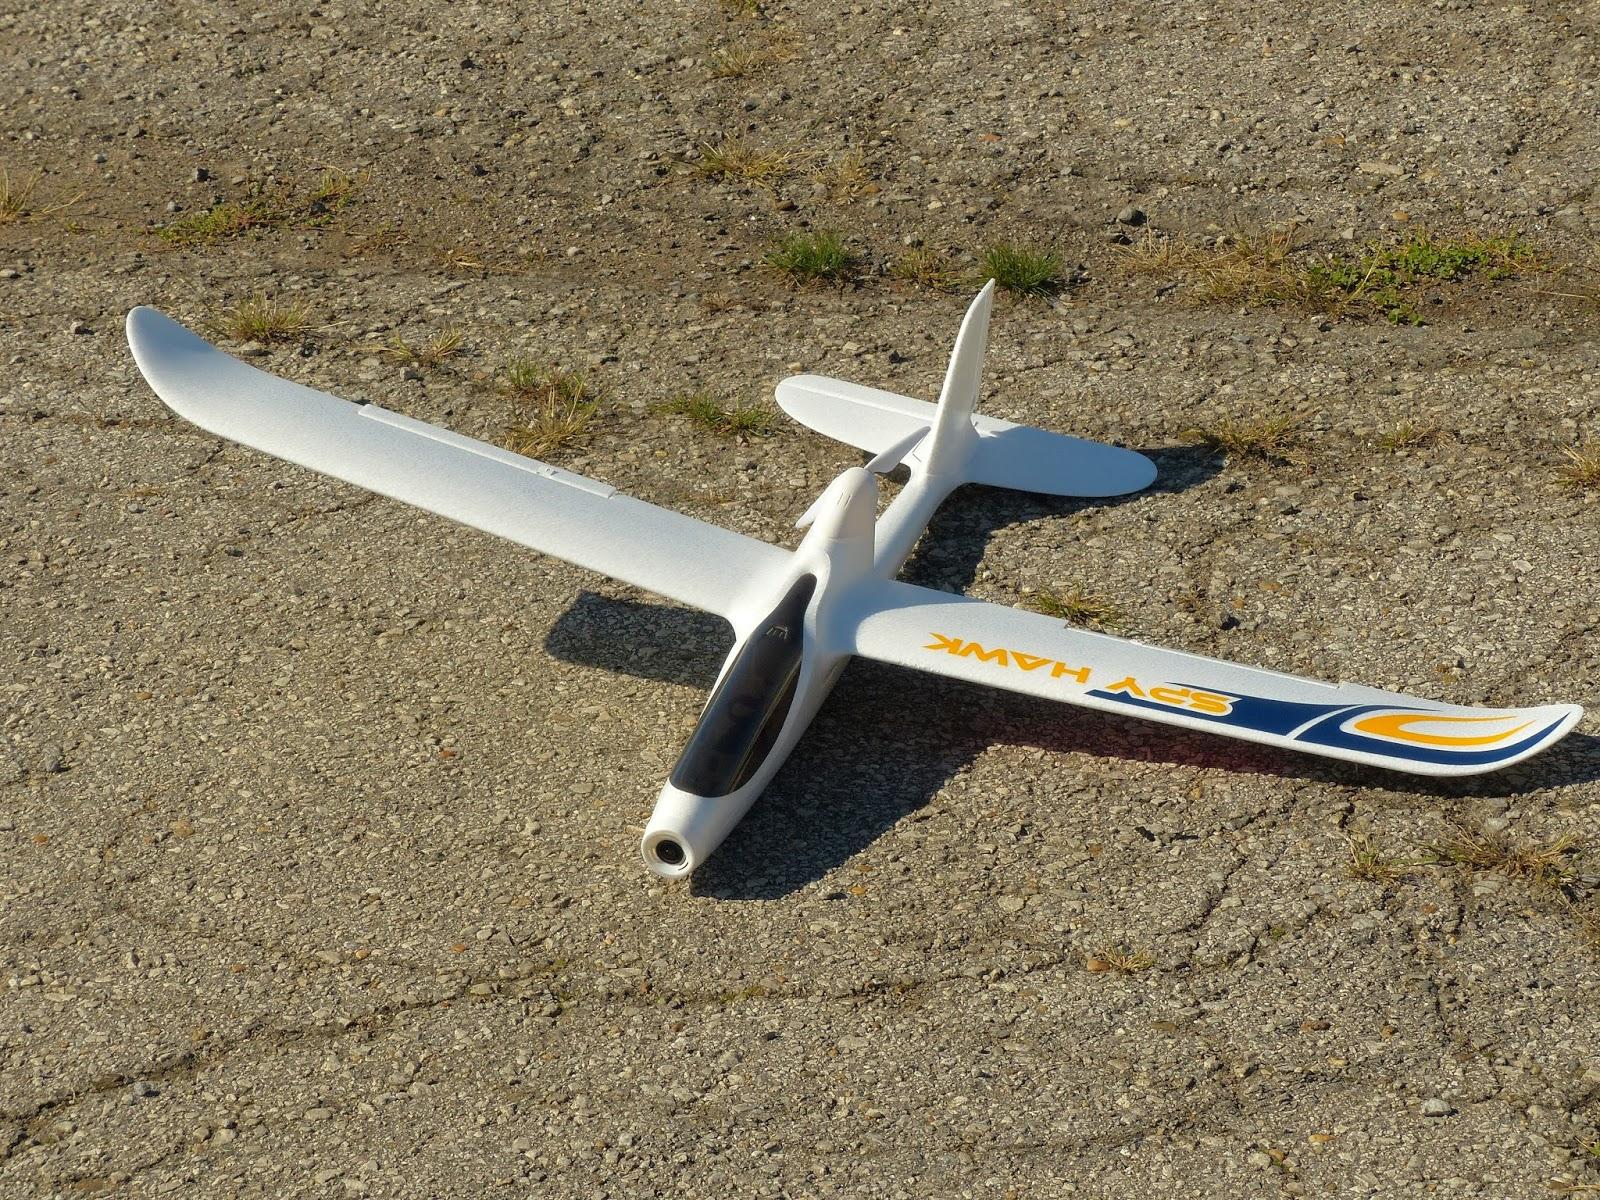 hubsan h301s hawk 5.8g fpv 4ch rc airplane rtf with gps ...